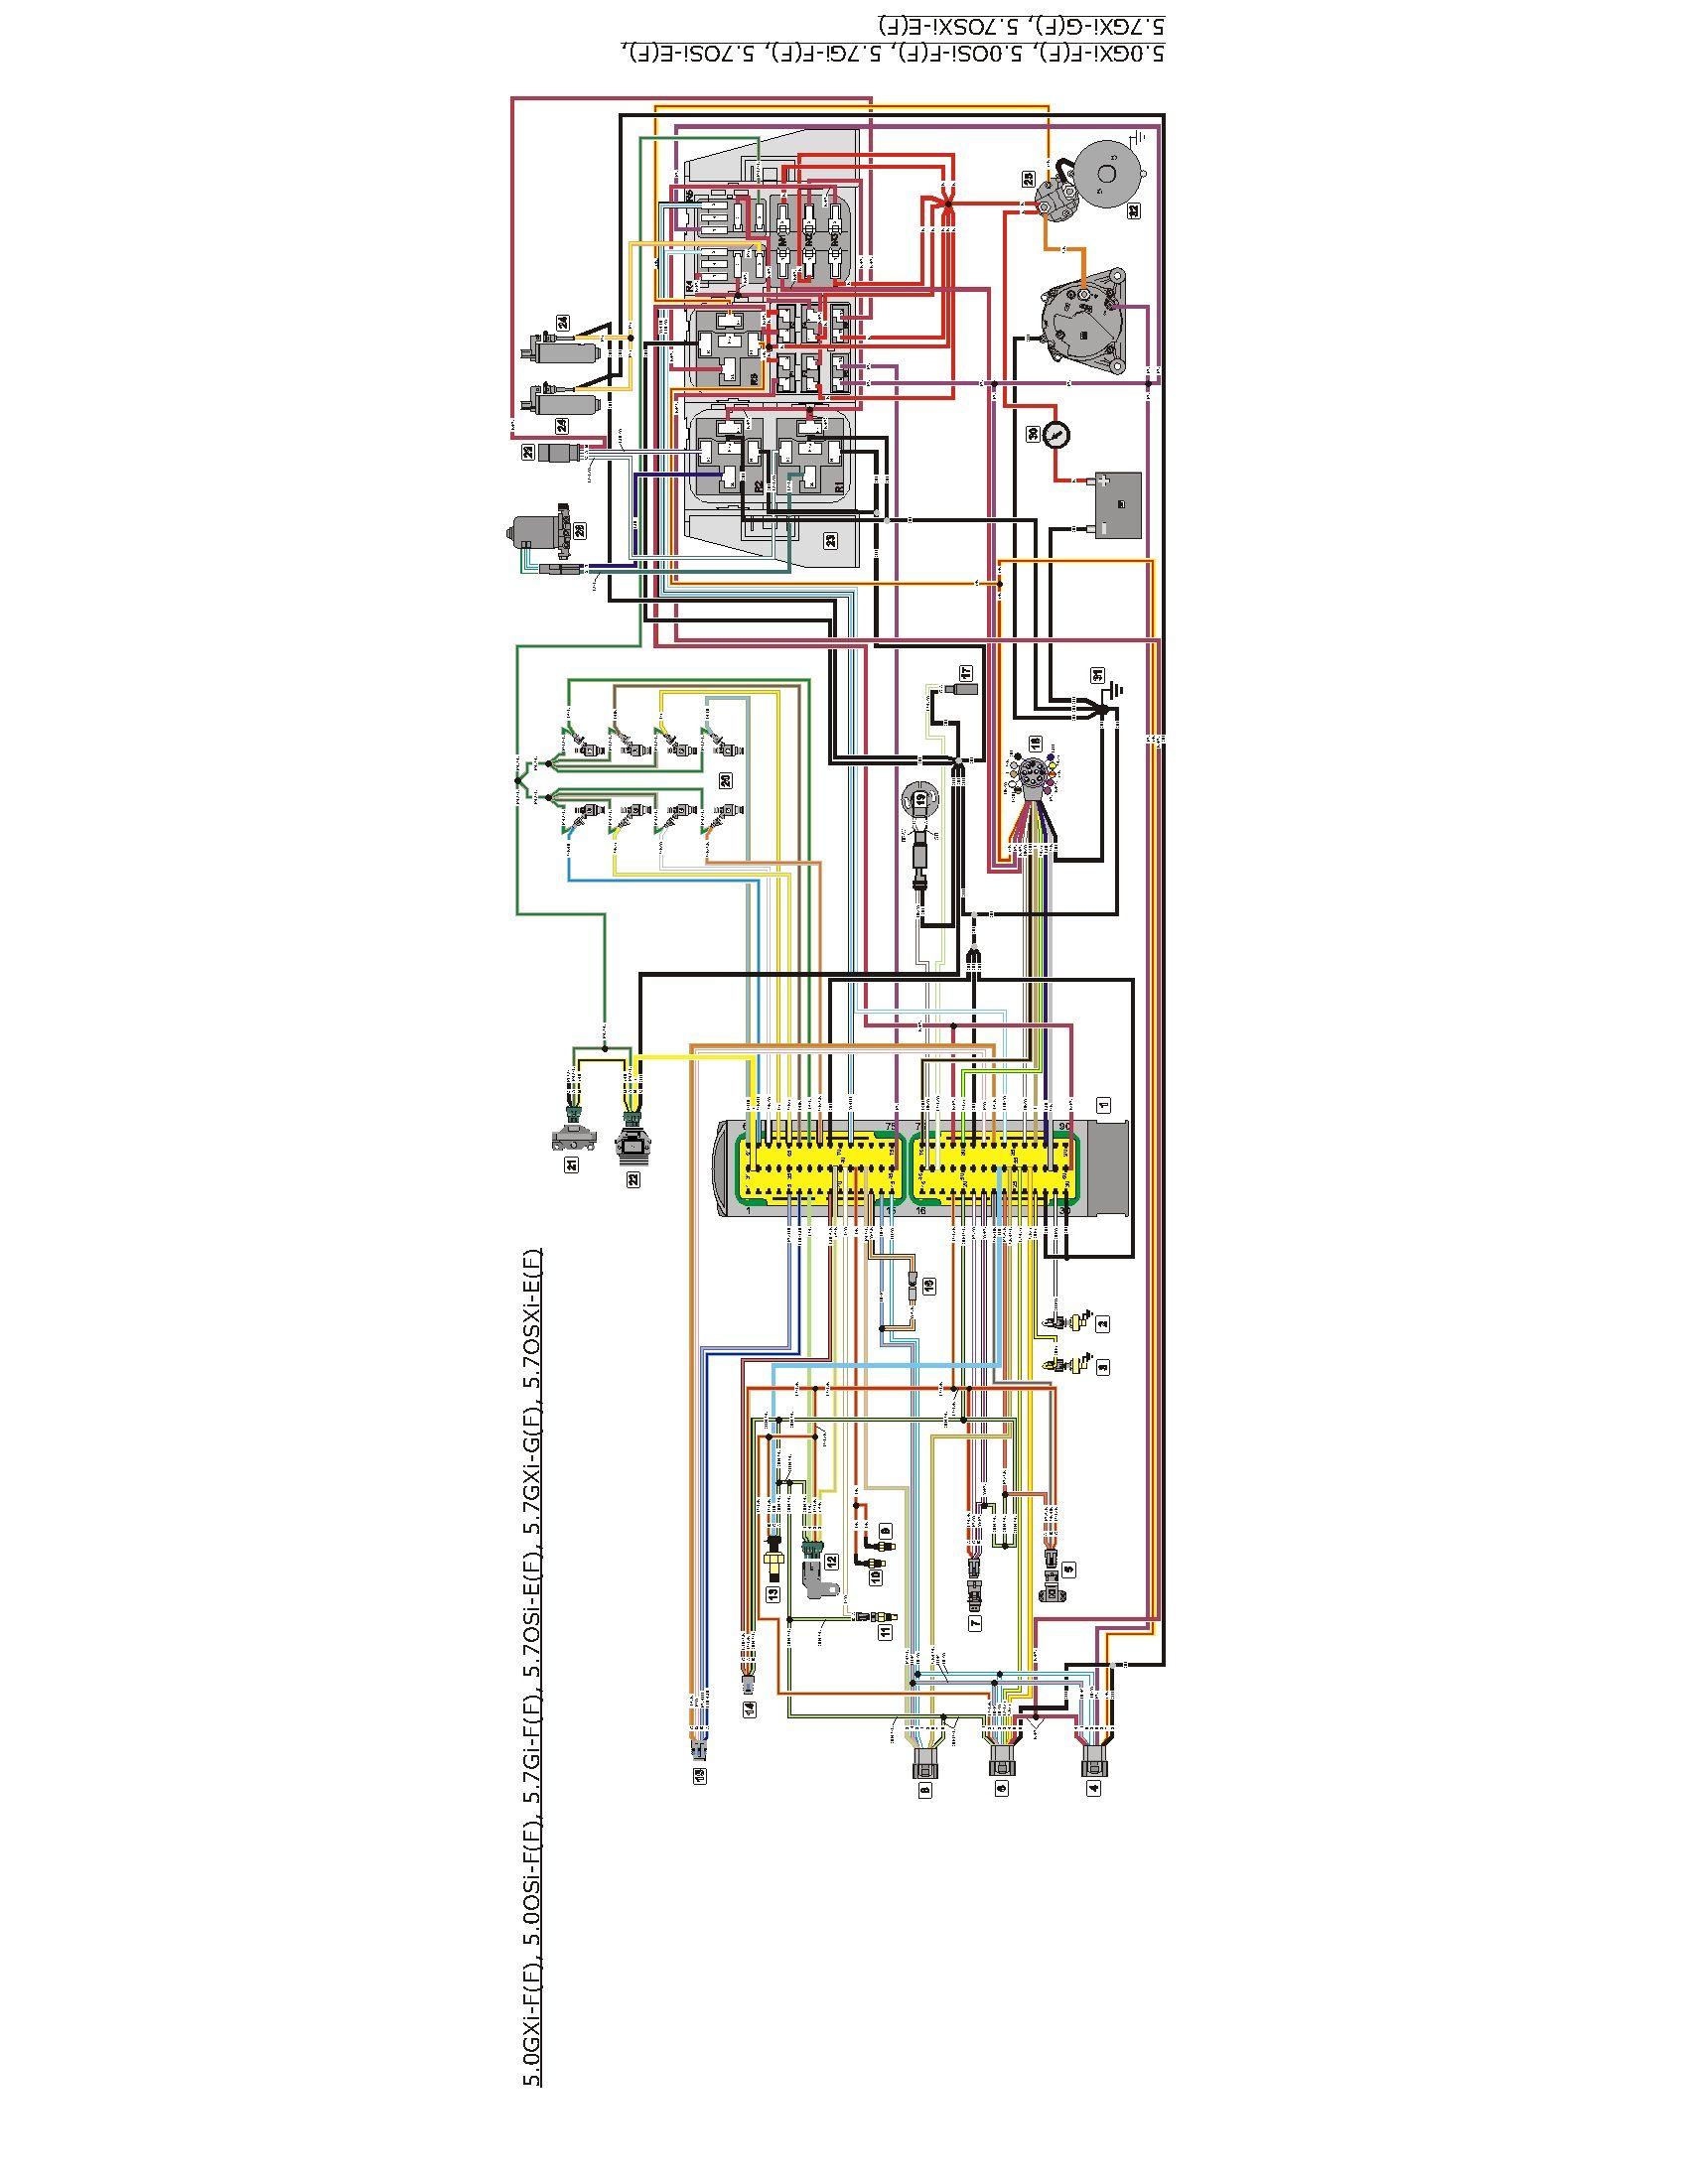 Volvo Penta Fuel Pump Wiring Diagram 5 0 Gl